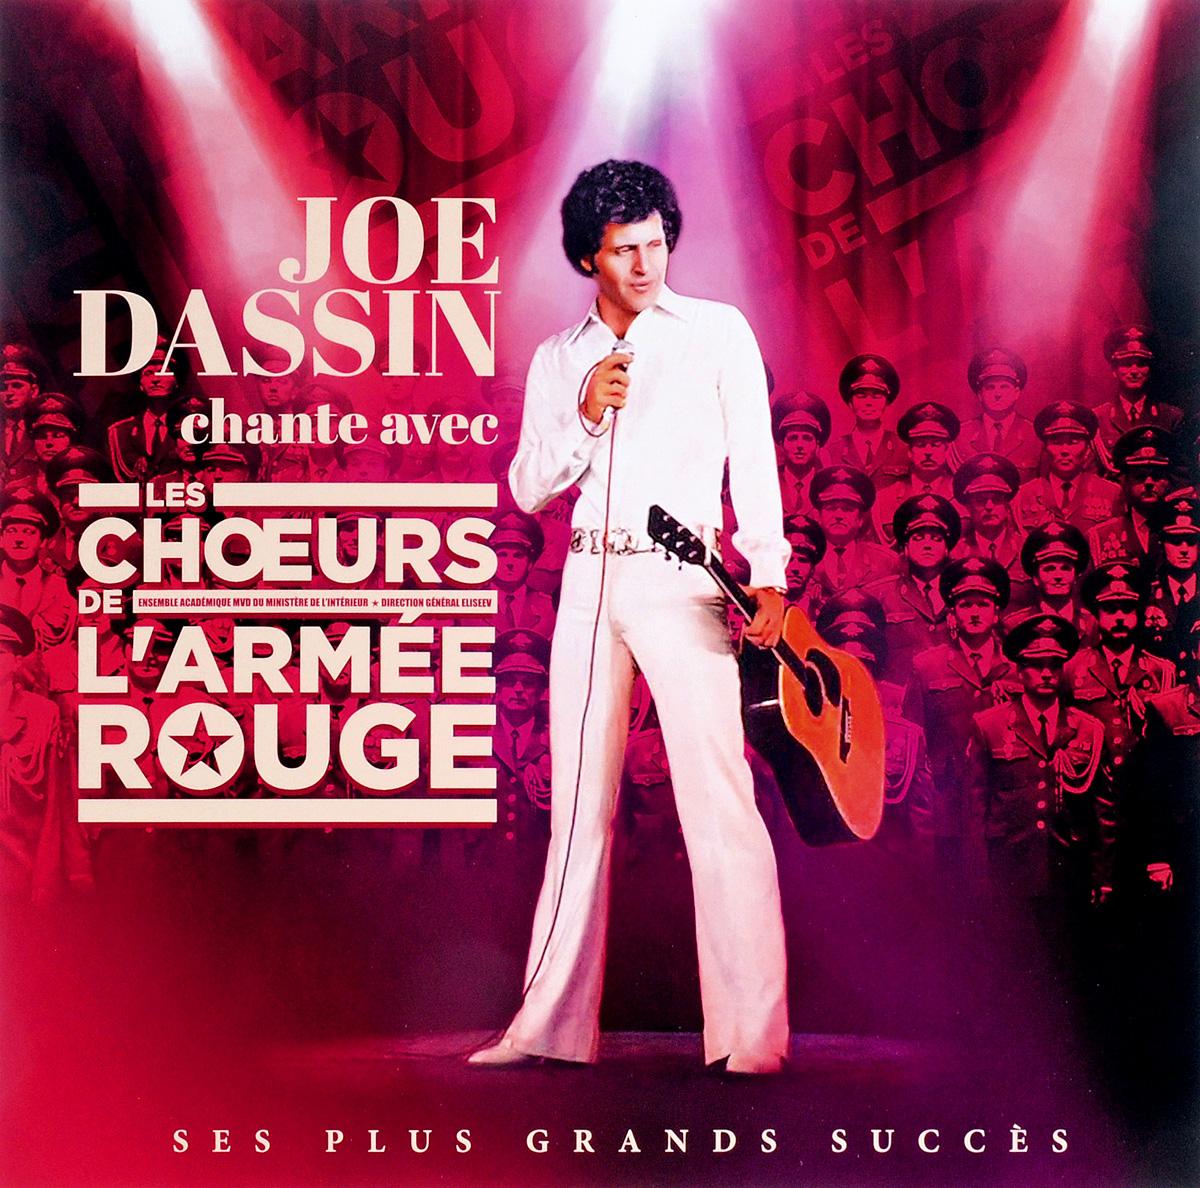 Джо Дассен Joe Dassin. Joe Dassin Chante Avec Les Choeurs De L'Armee Rouge (LP) джо хендерсон joe henderson mode for joe lp